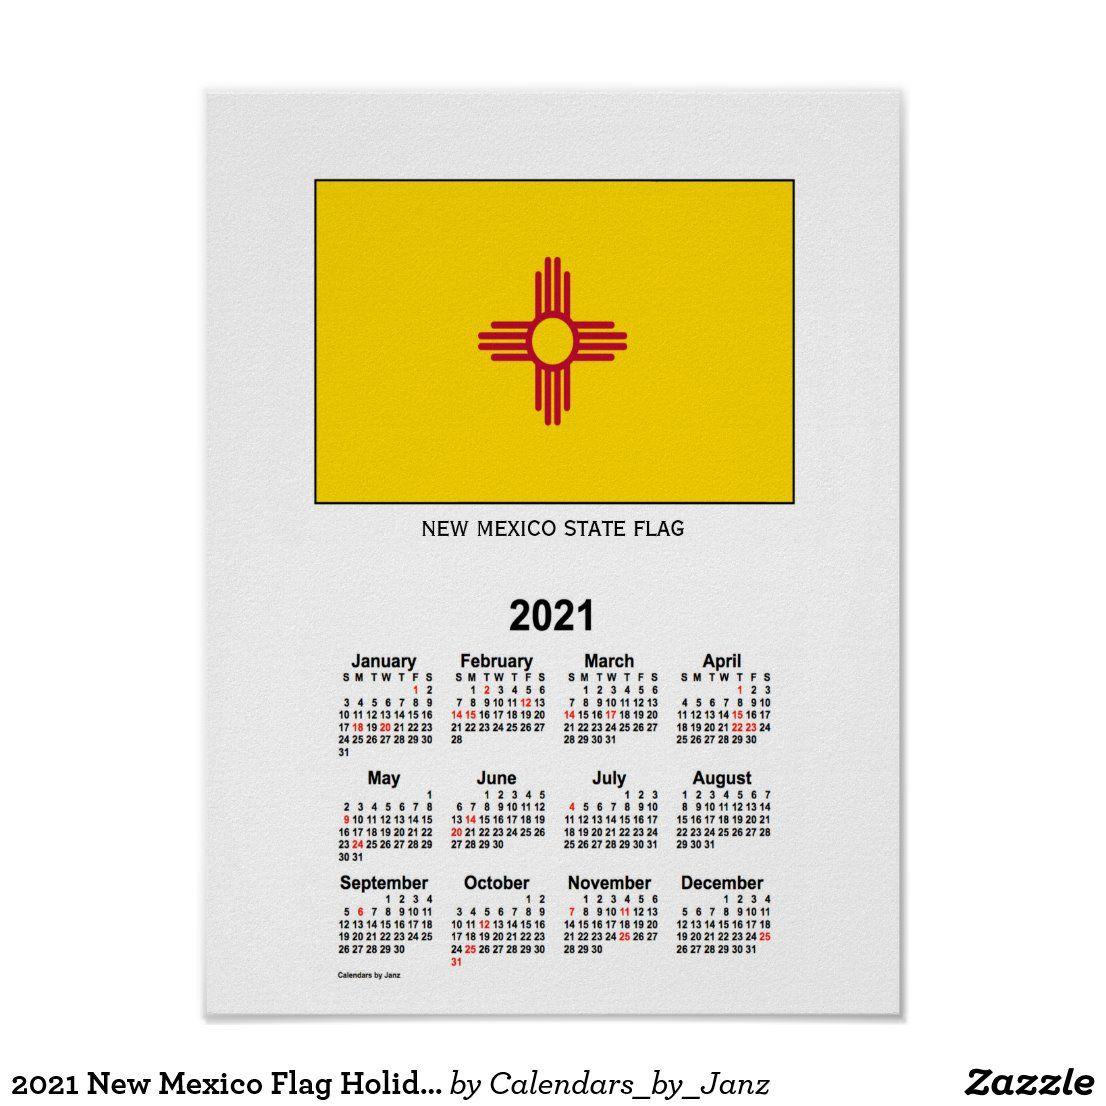 2021 New Mexico Flag Holiday Calendar By Janz Poster Zazzle Com In 2020 New Mexico State Flag New Mexico Flag Holiday Calendar